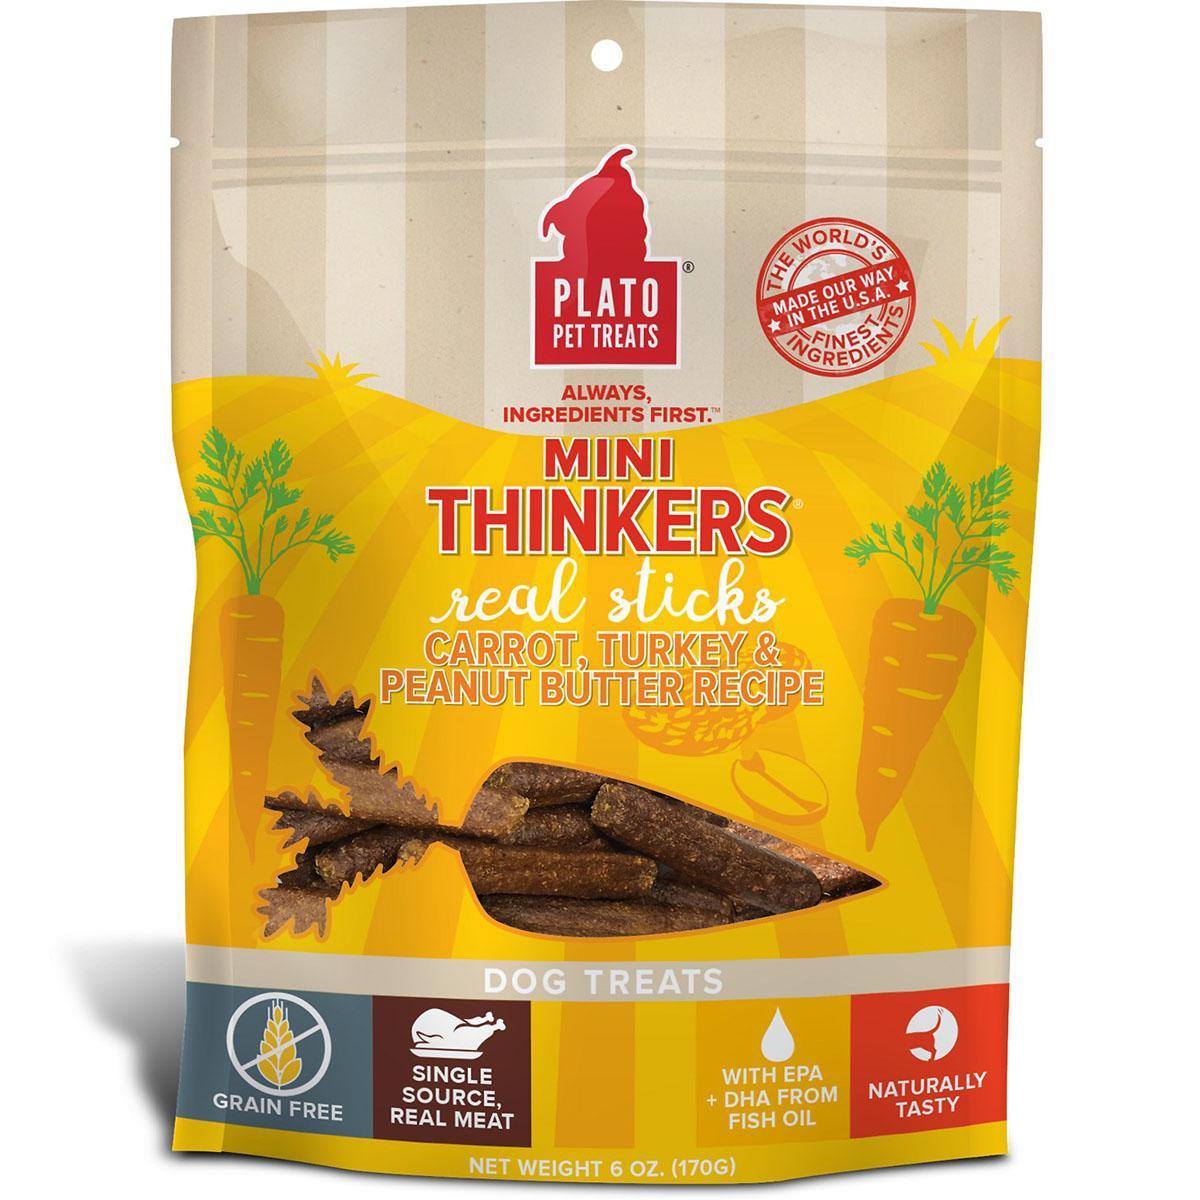 Plato Mini Thinkers Grain-Free Carrot, Turkey & Peanut Butter Dog Treats